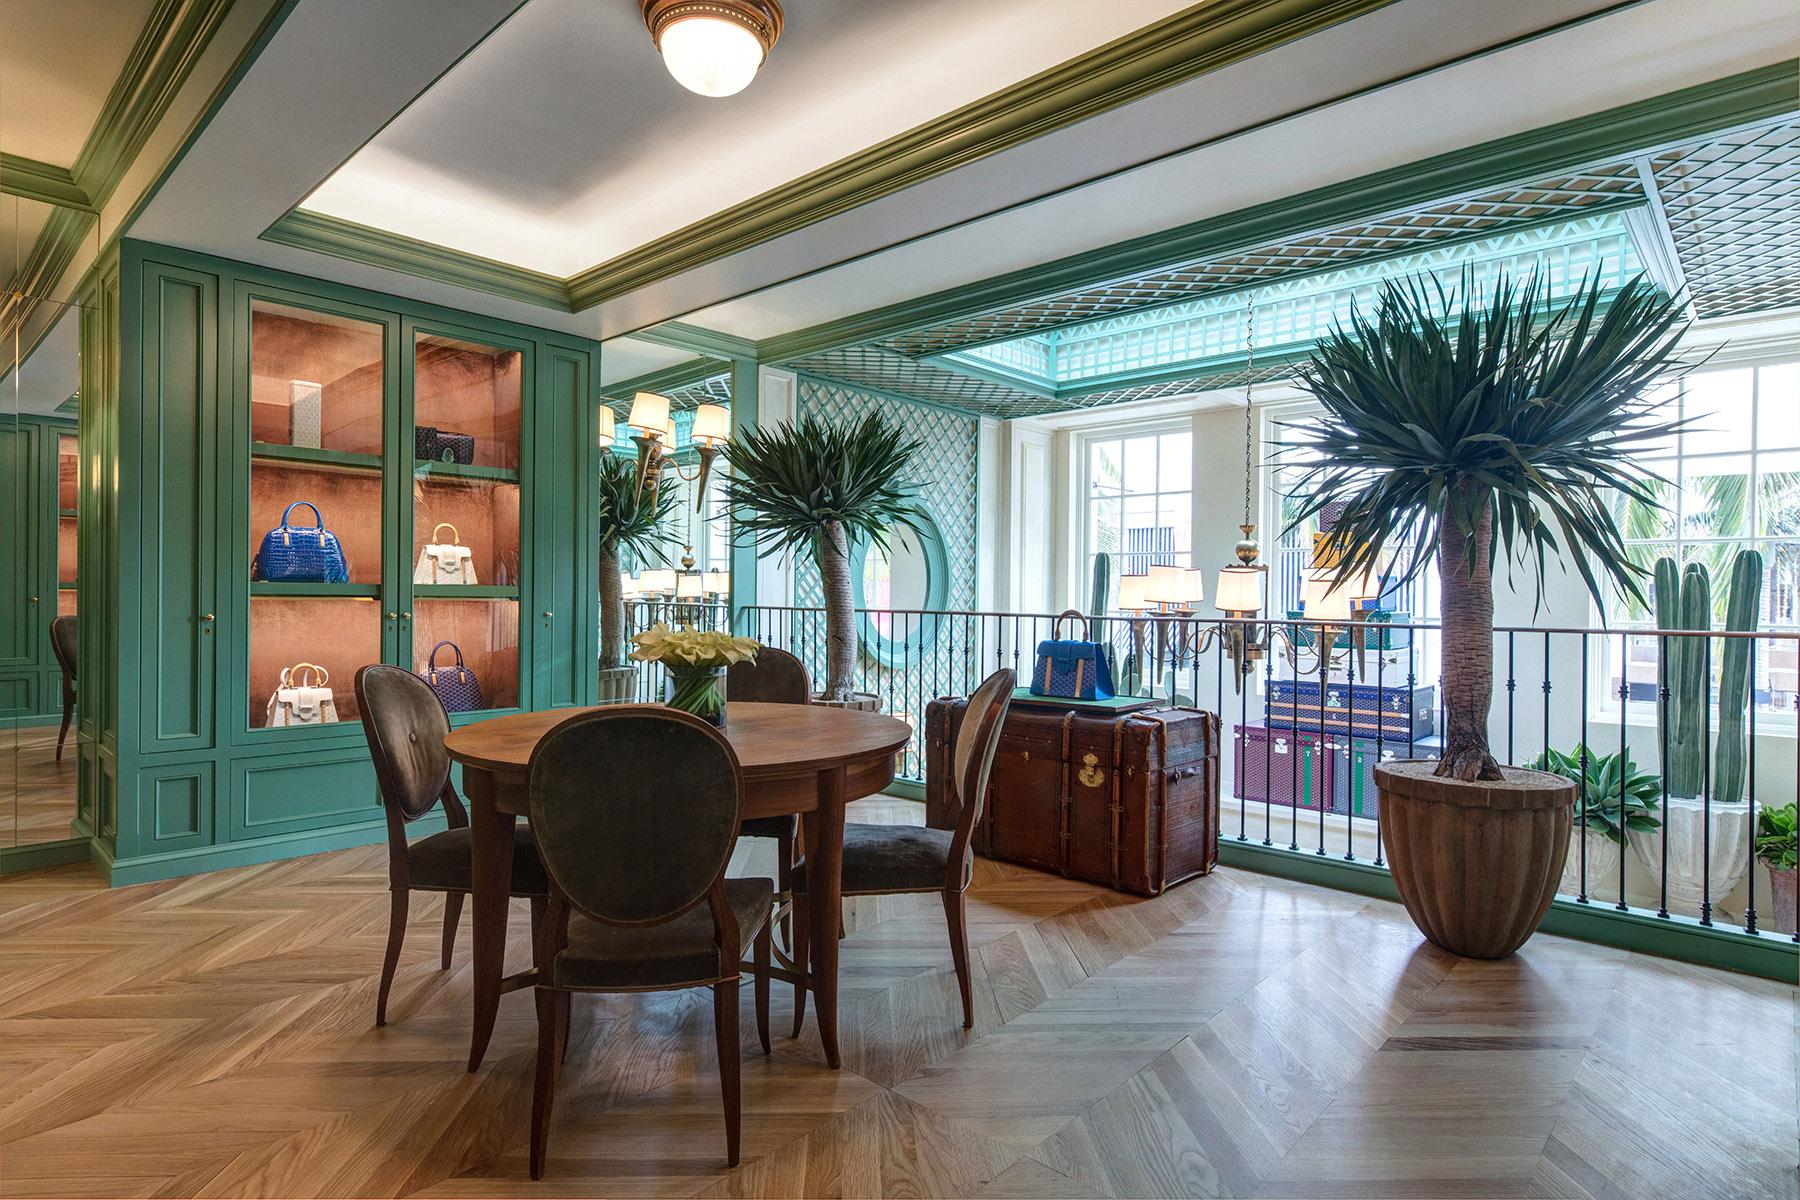 Goyard – Beverly Hills, Los Angeles |  David Thomas Design / Architect